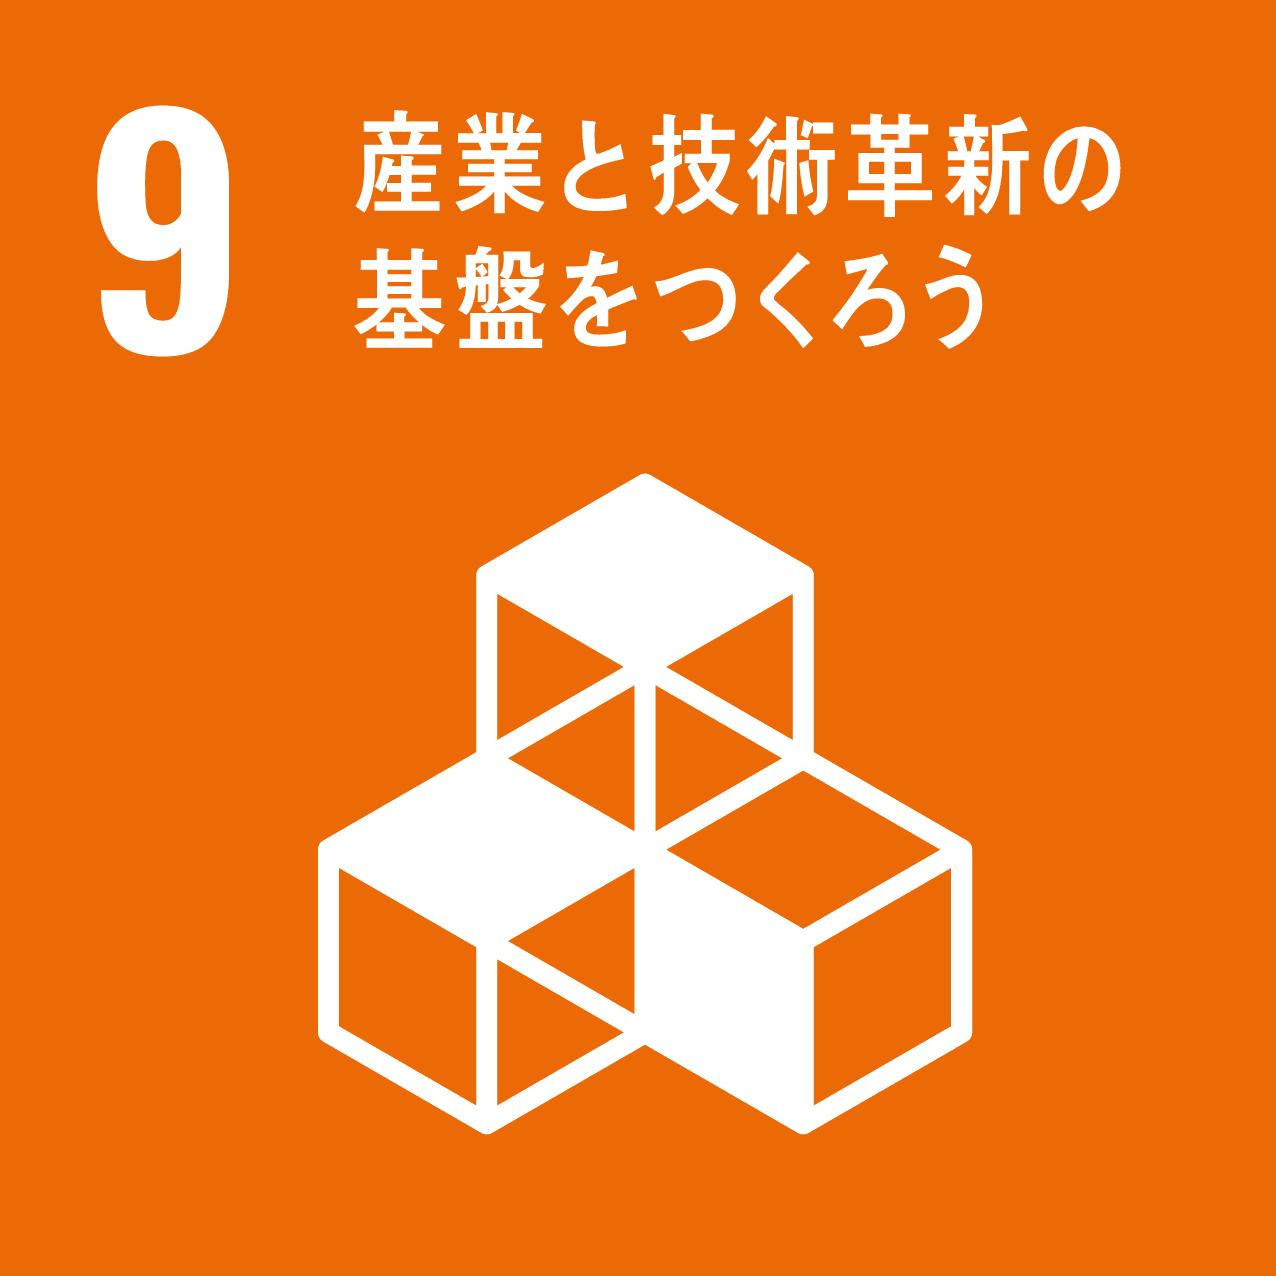 https://okaji.co.jp/files/libs/106/202006151707259257.png